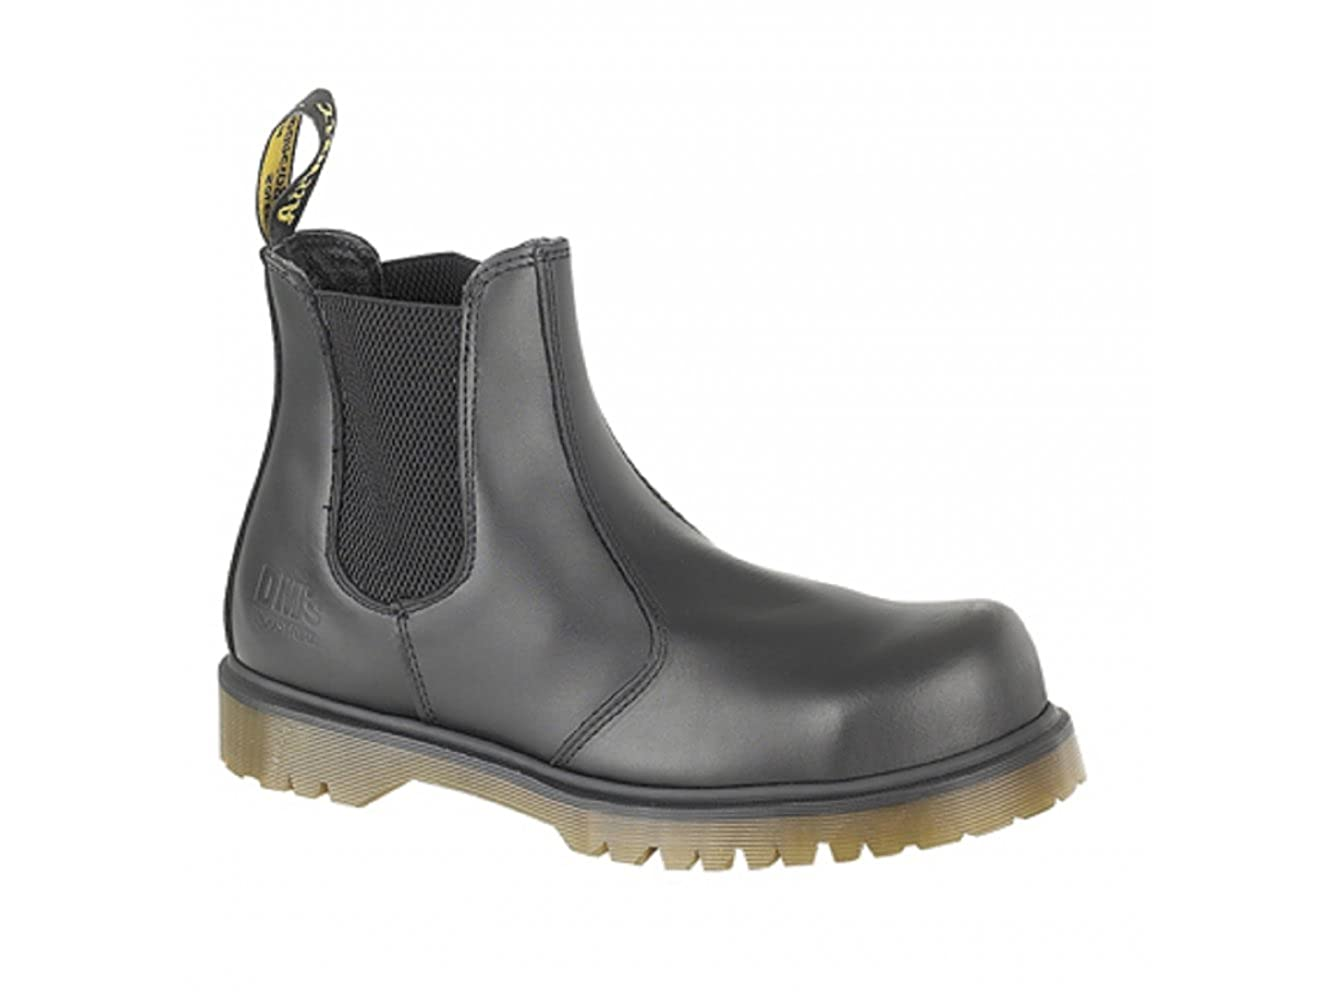 Dr. Martens Men's Industrial Chelsea BootSafety Toe Cap